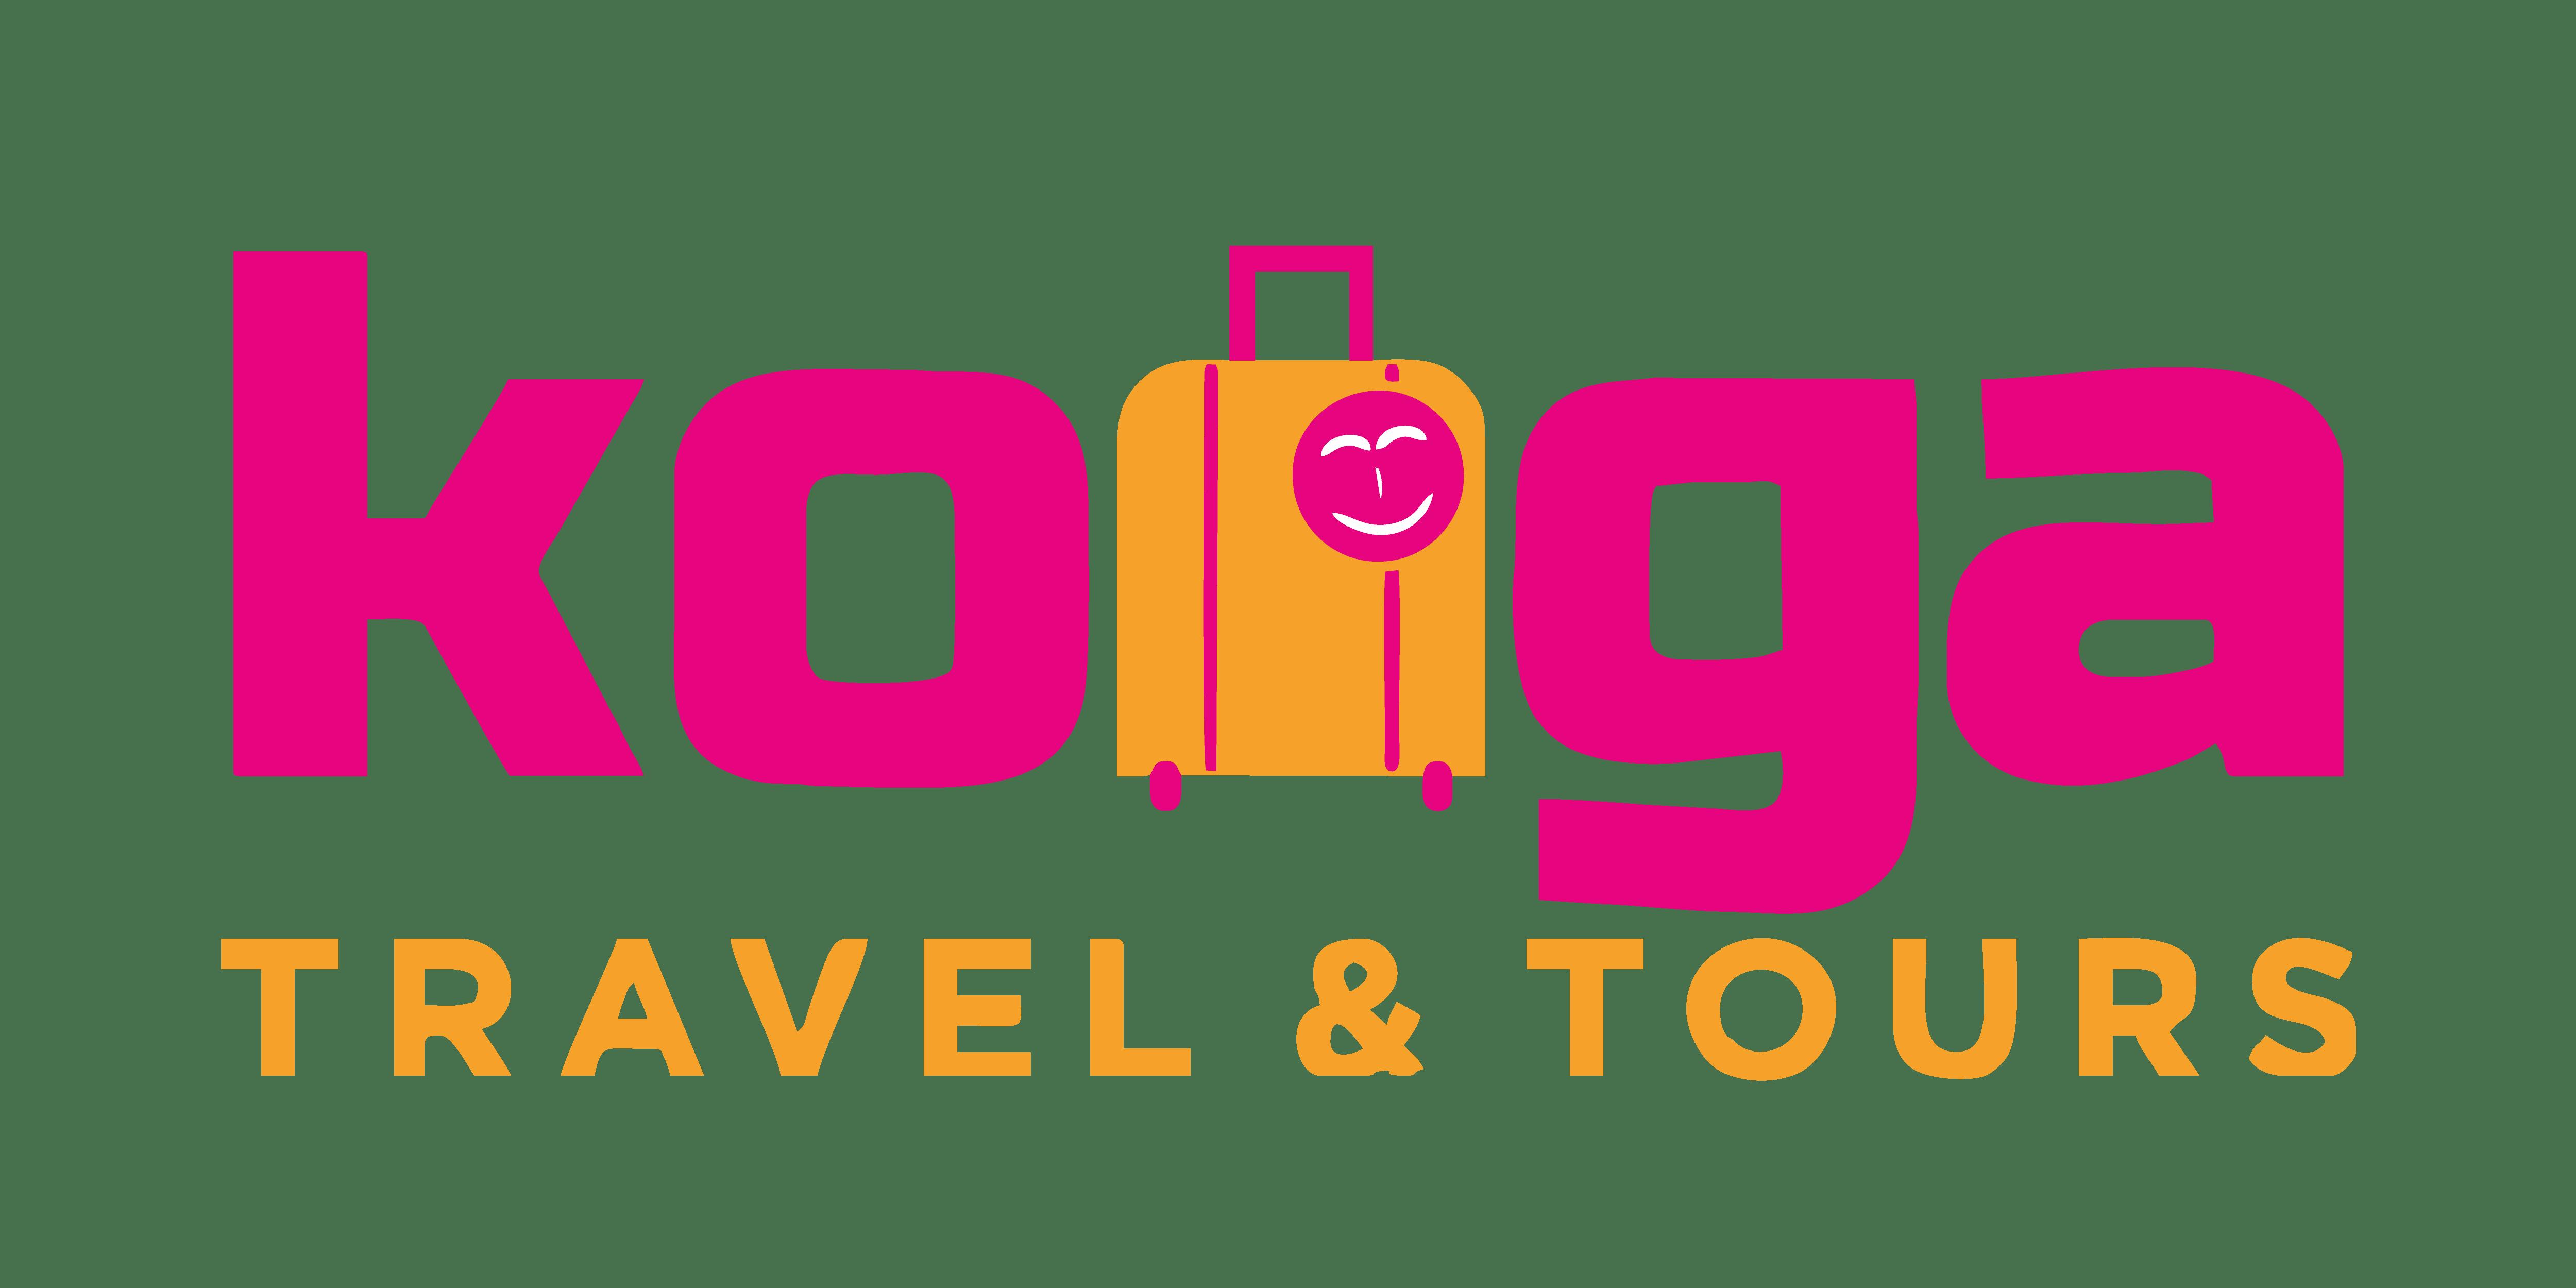 Konga Travel & Tours - Our Businesses